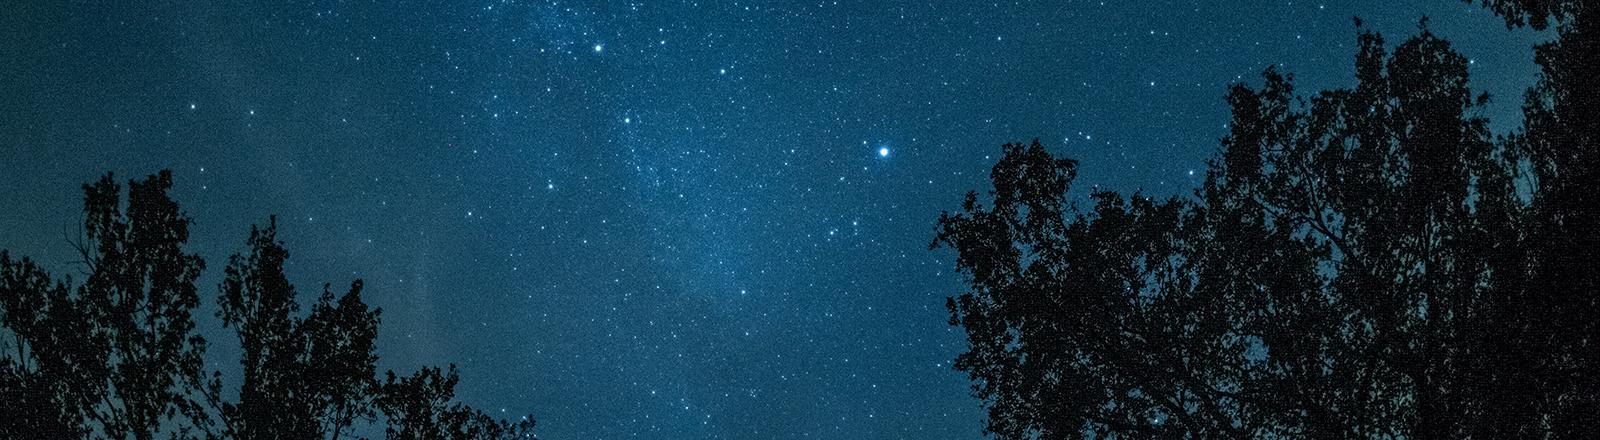 Sternenhimmel.